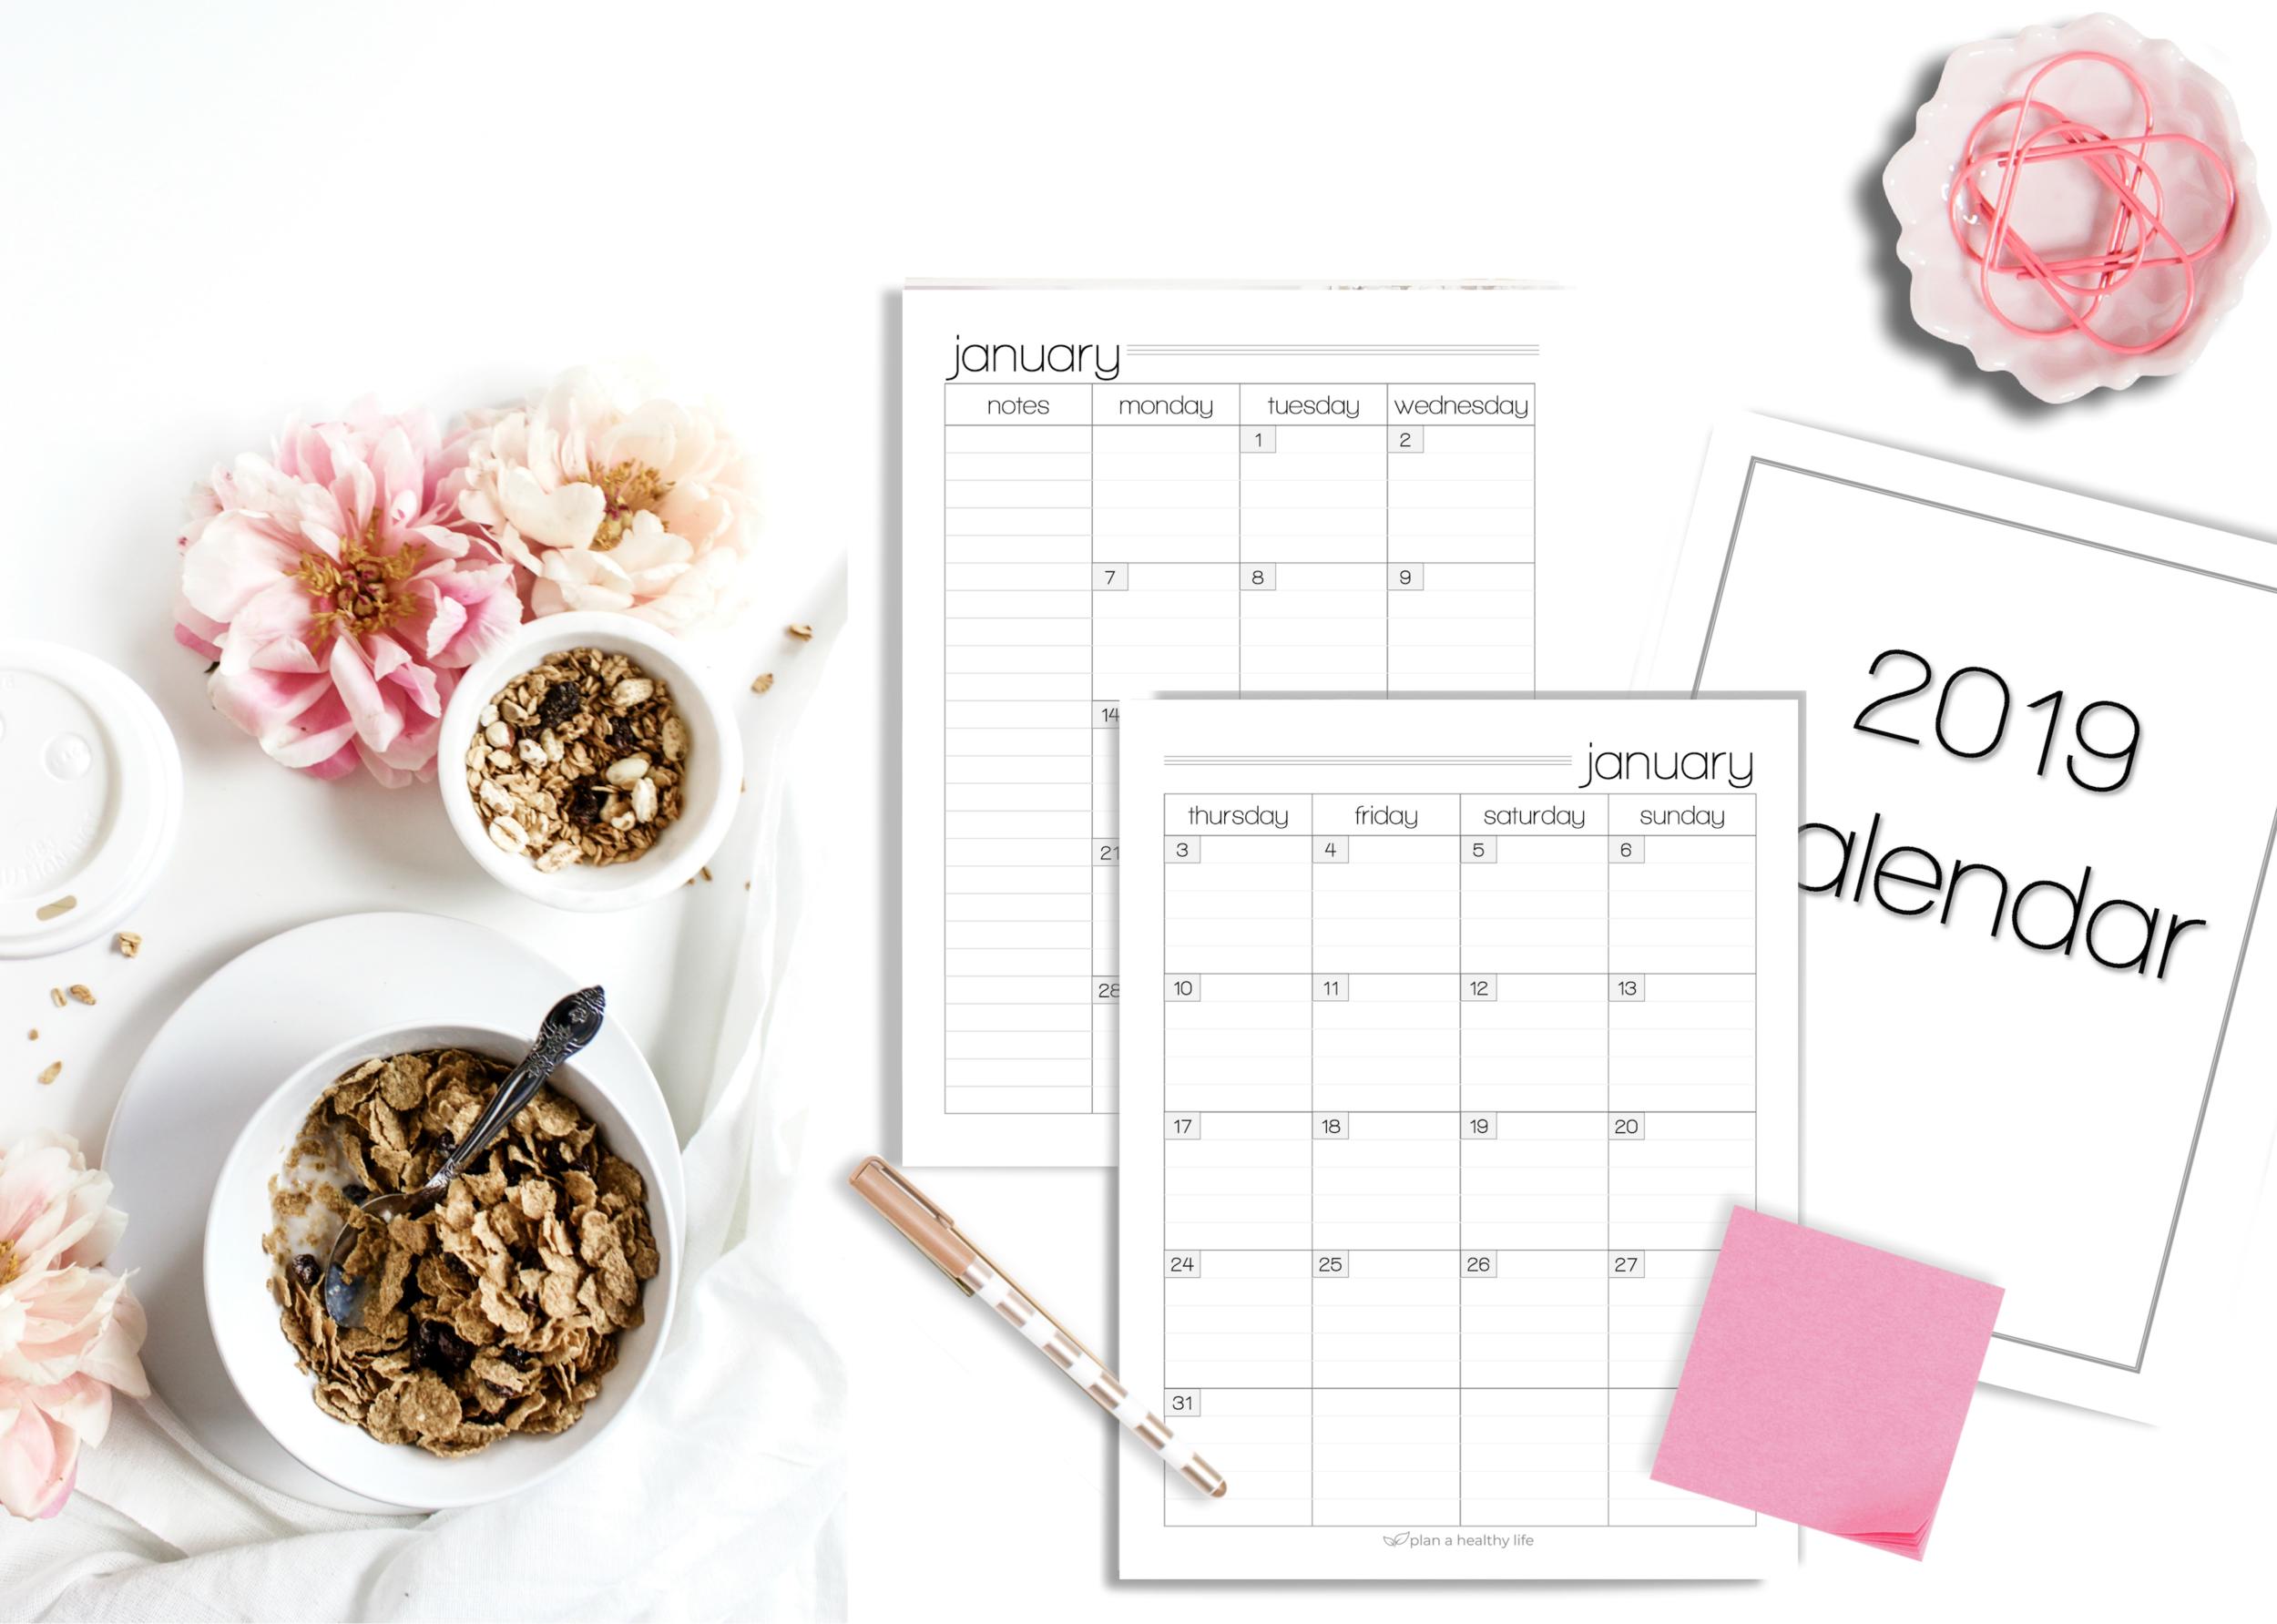 december freebie 2019 calendar plan a healthy life